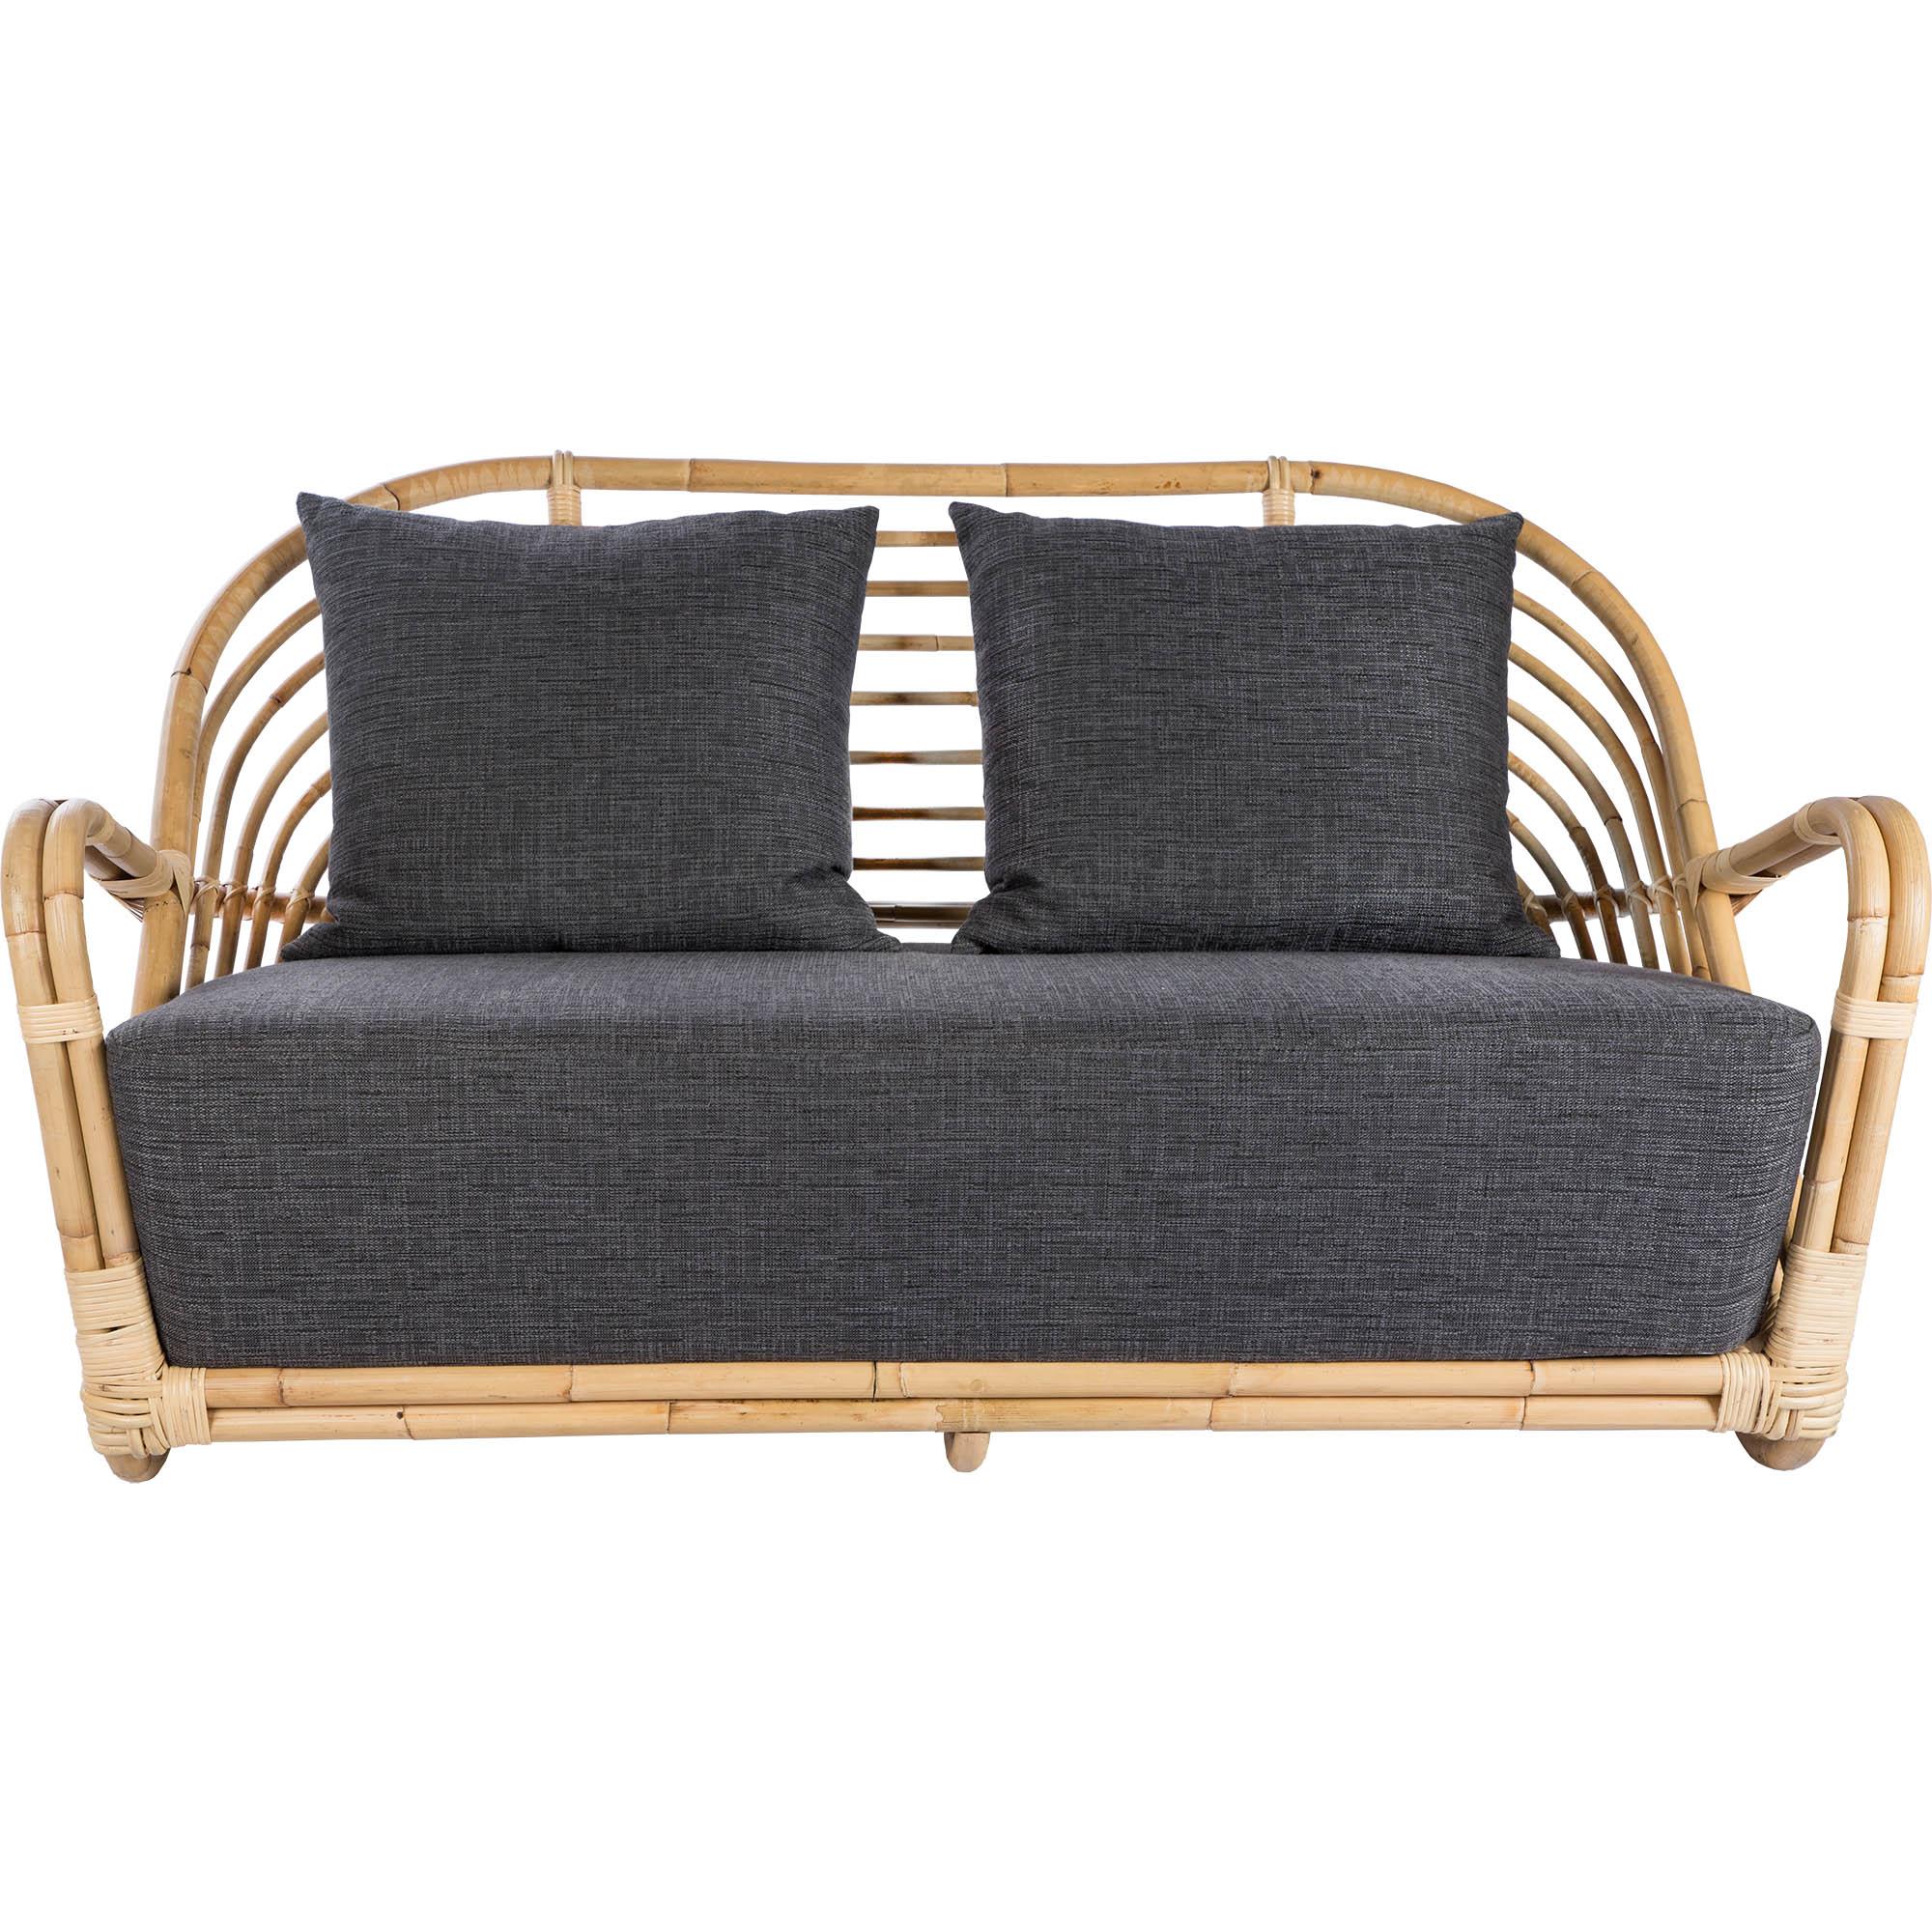 Charlottenborg soffa i rotting från Sika-Design.